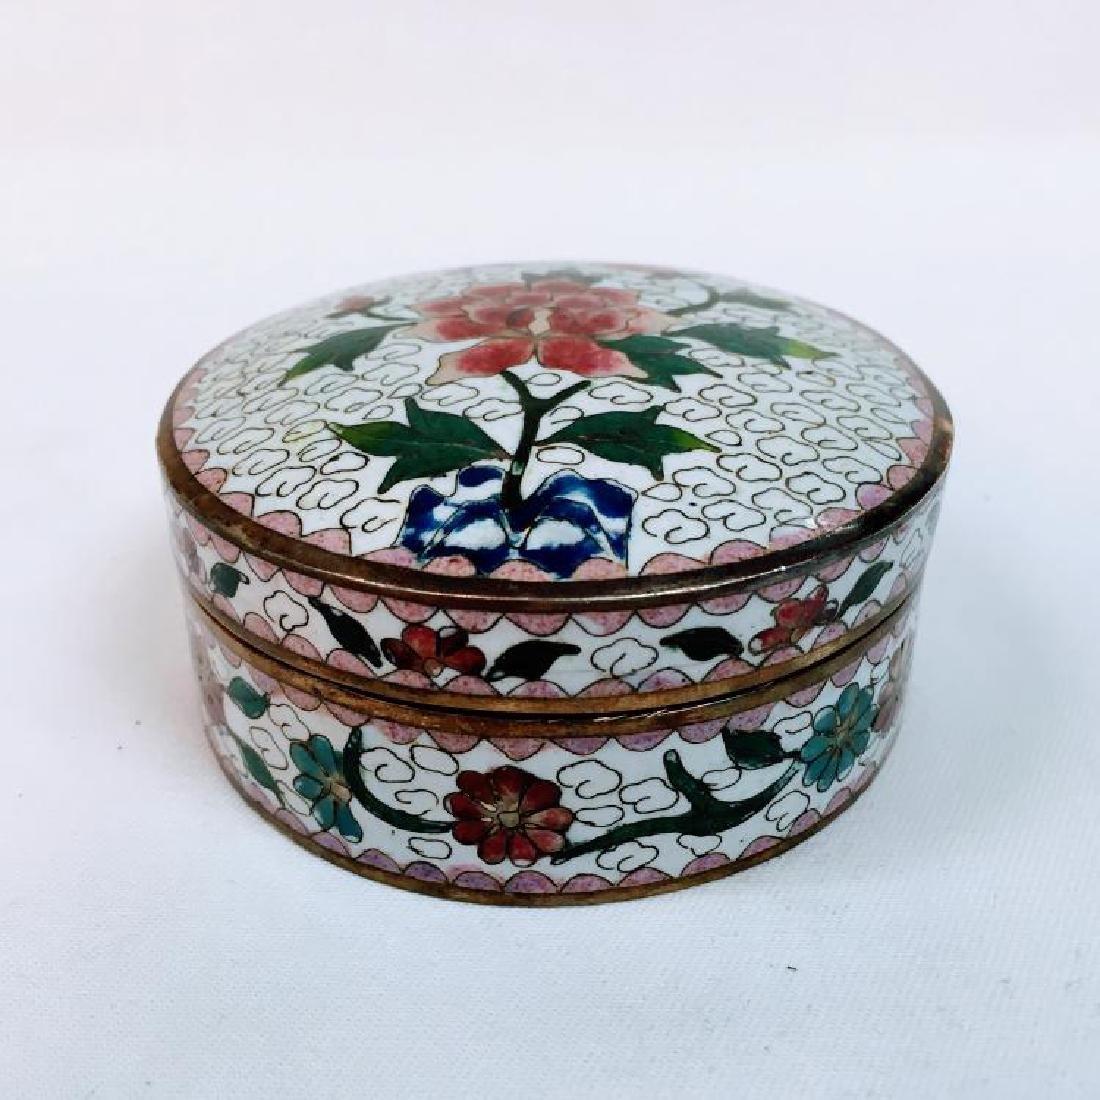 ANTIQUE CHINESE CLOISONNE ROUND FLORAL TRINKET BOX